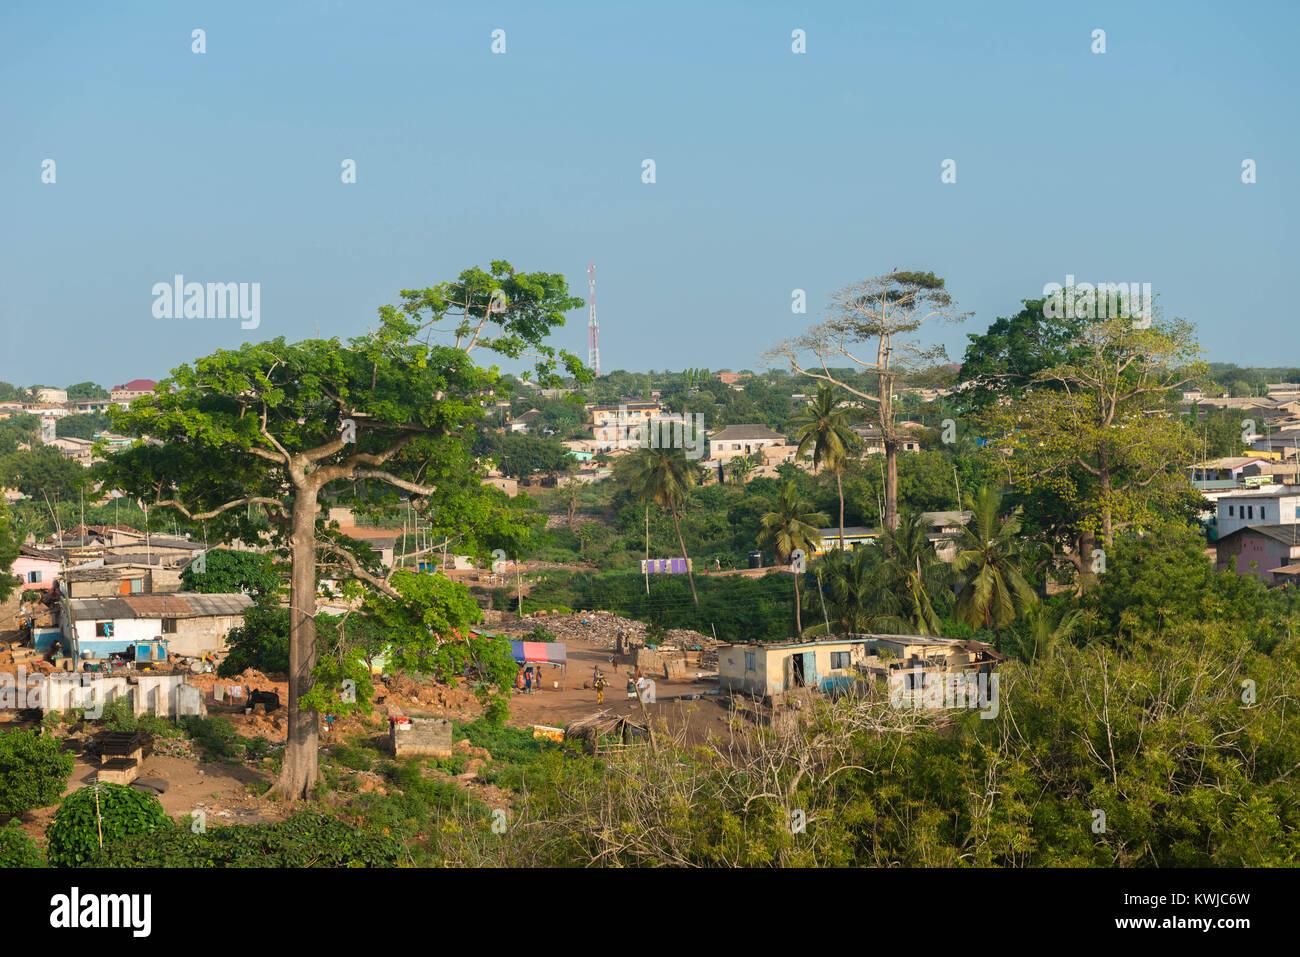 Small town of Senya Beraku, Gold Coast, Central Region, Ghana, Africa - Stock Image